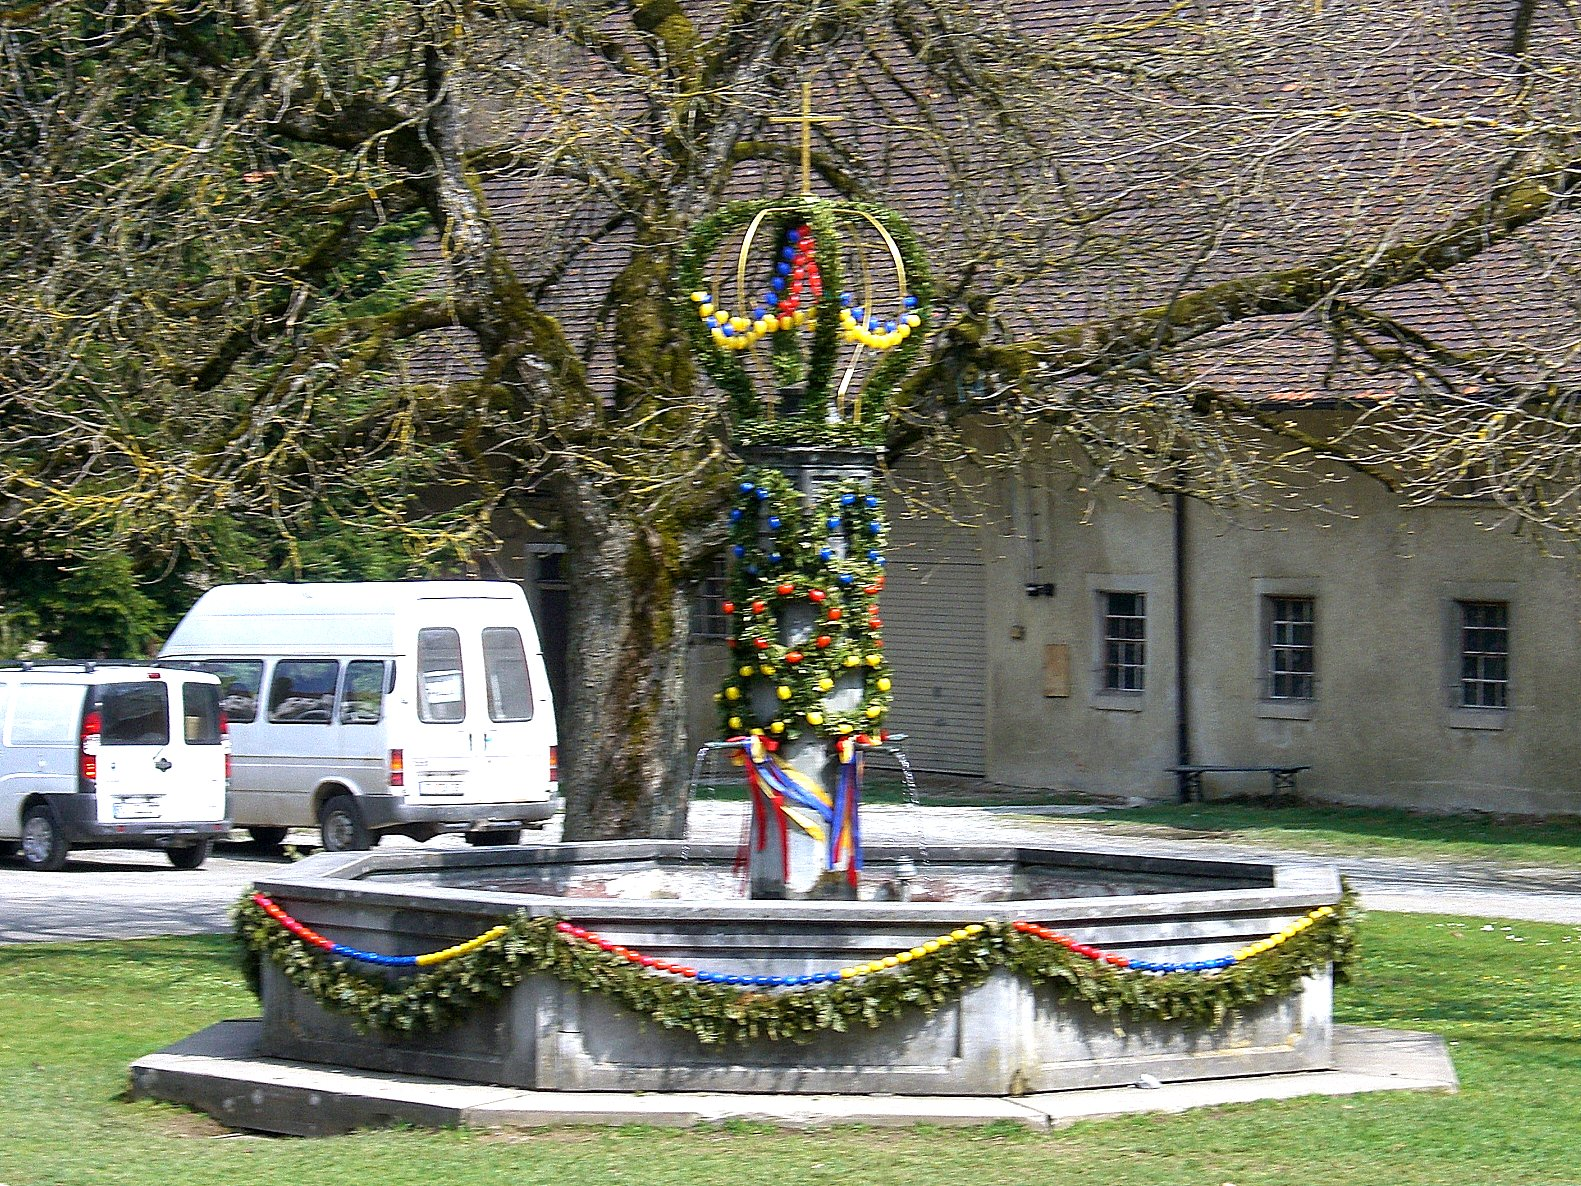 Osterbrunnen (Easter well) in Wolfegg, Germany